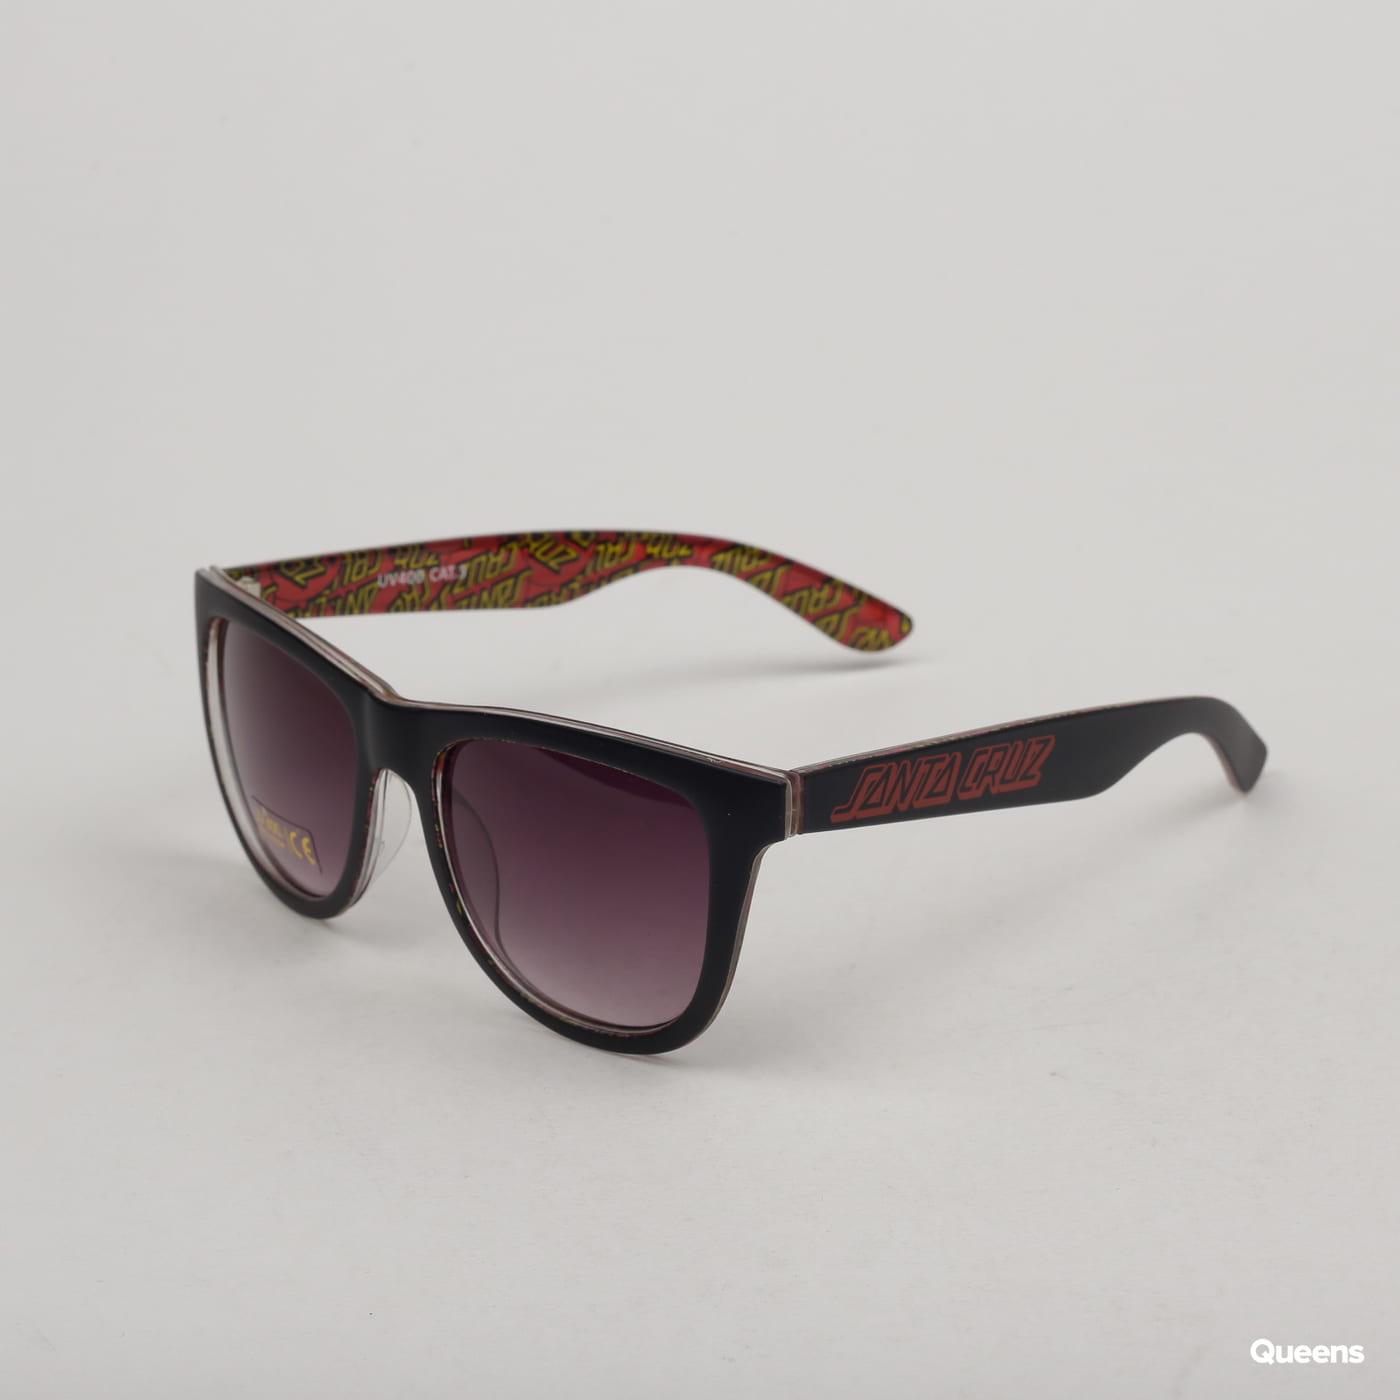 Santa Cruz Multi Classic Dot Sunglasses black / multicolor